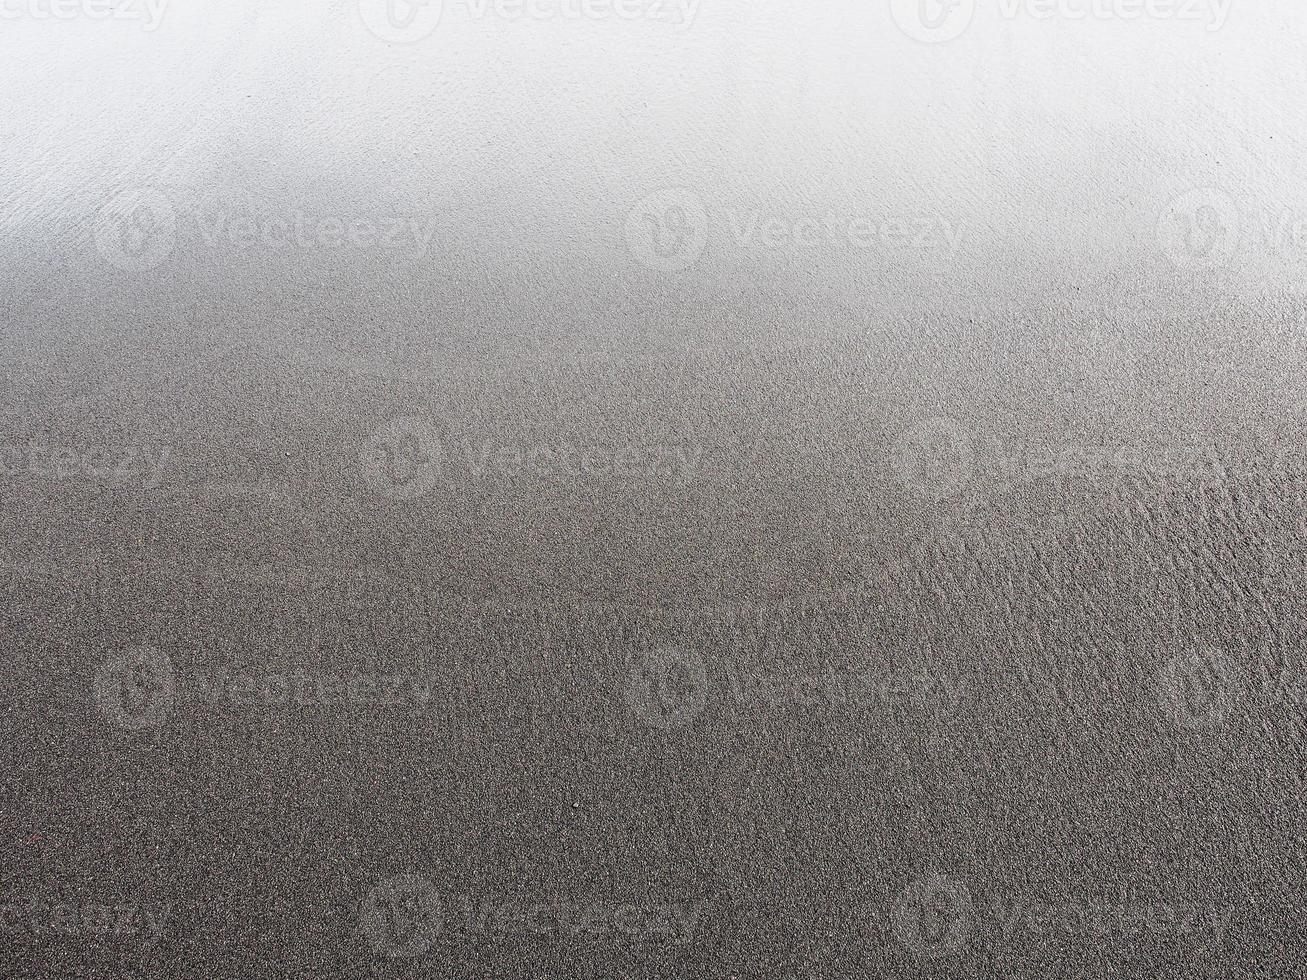 Punaluu schwarzer Sandstrand. foto